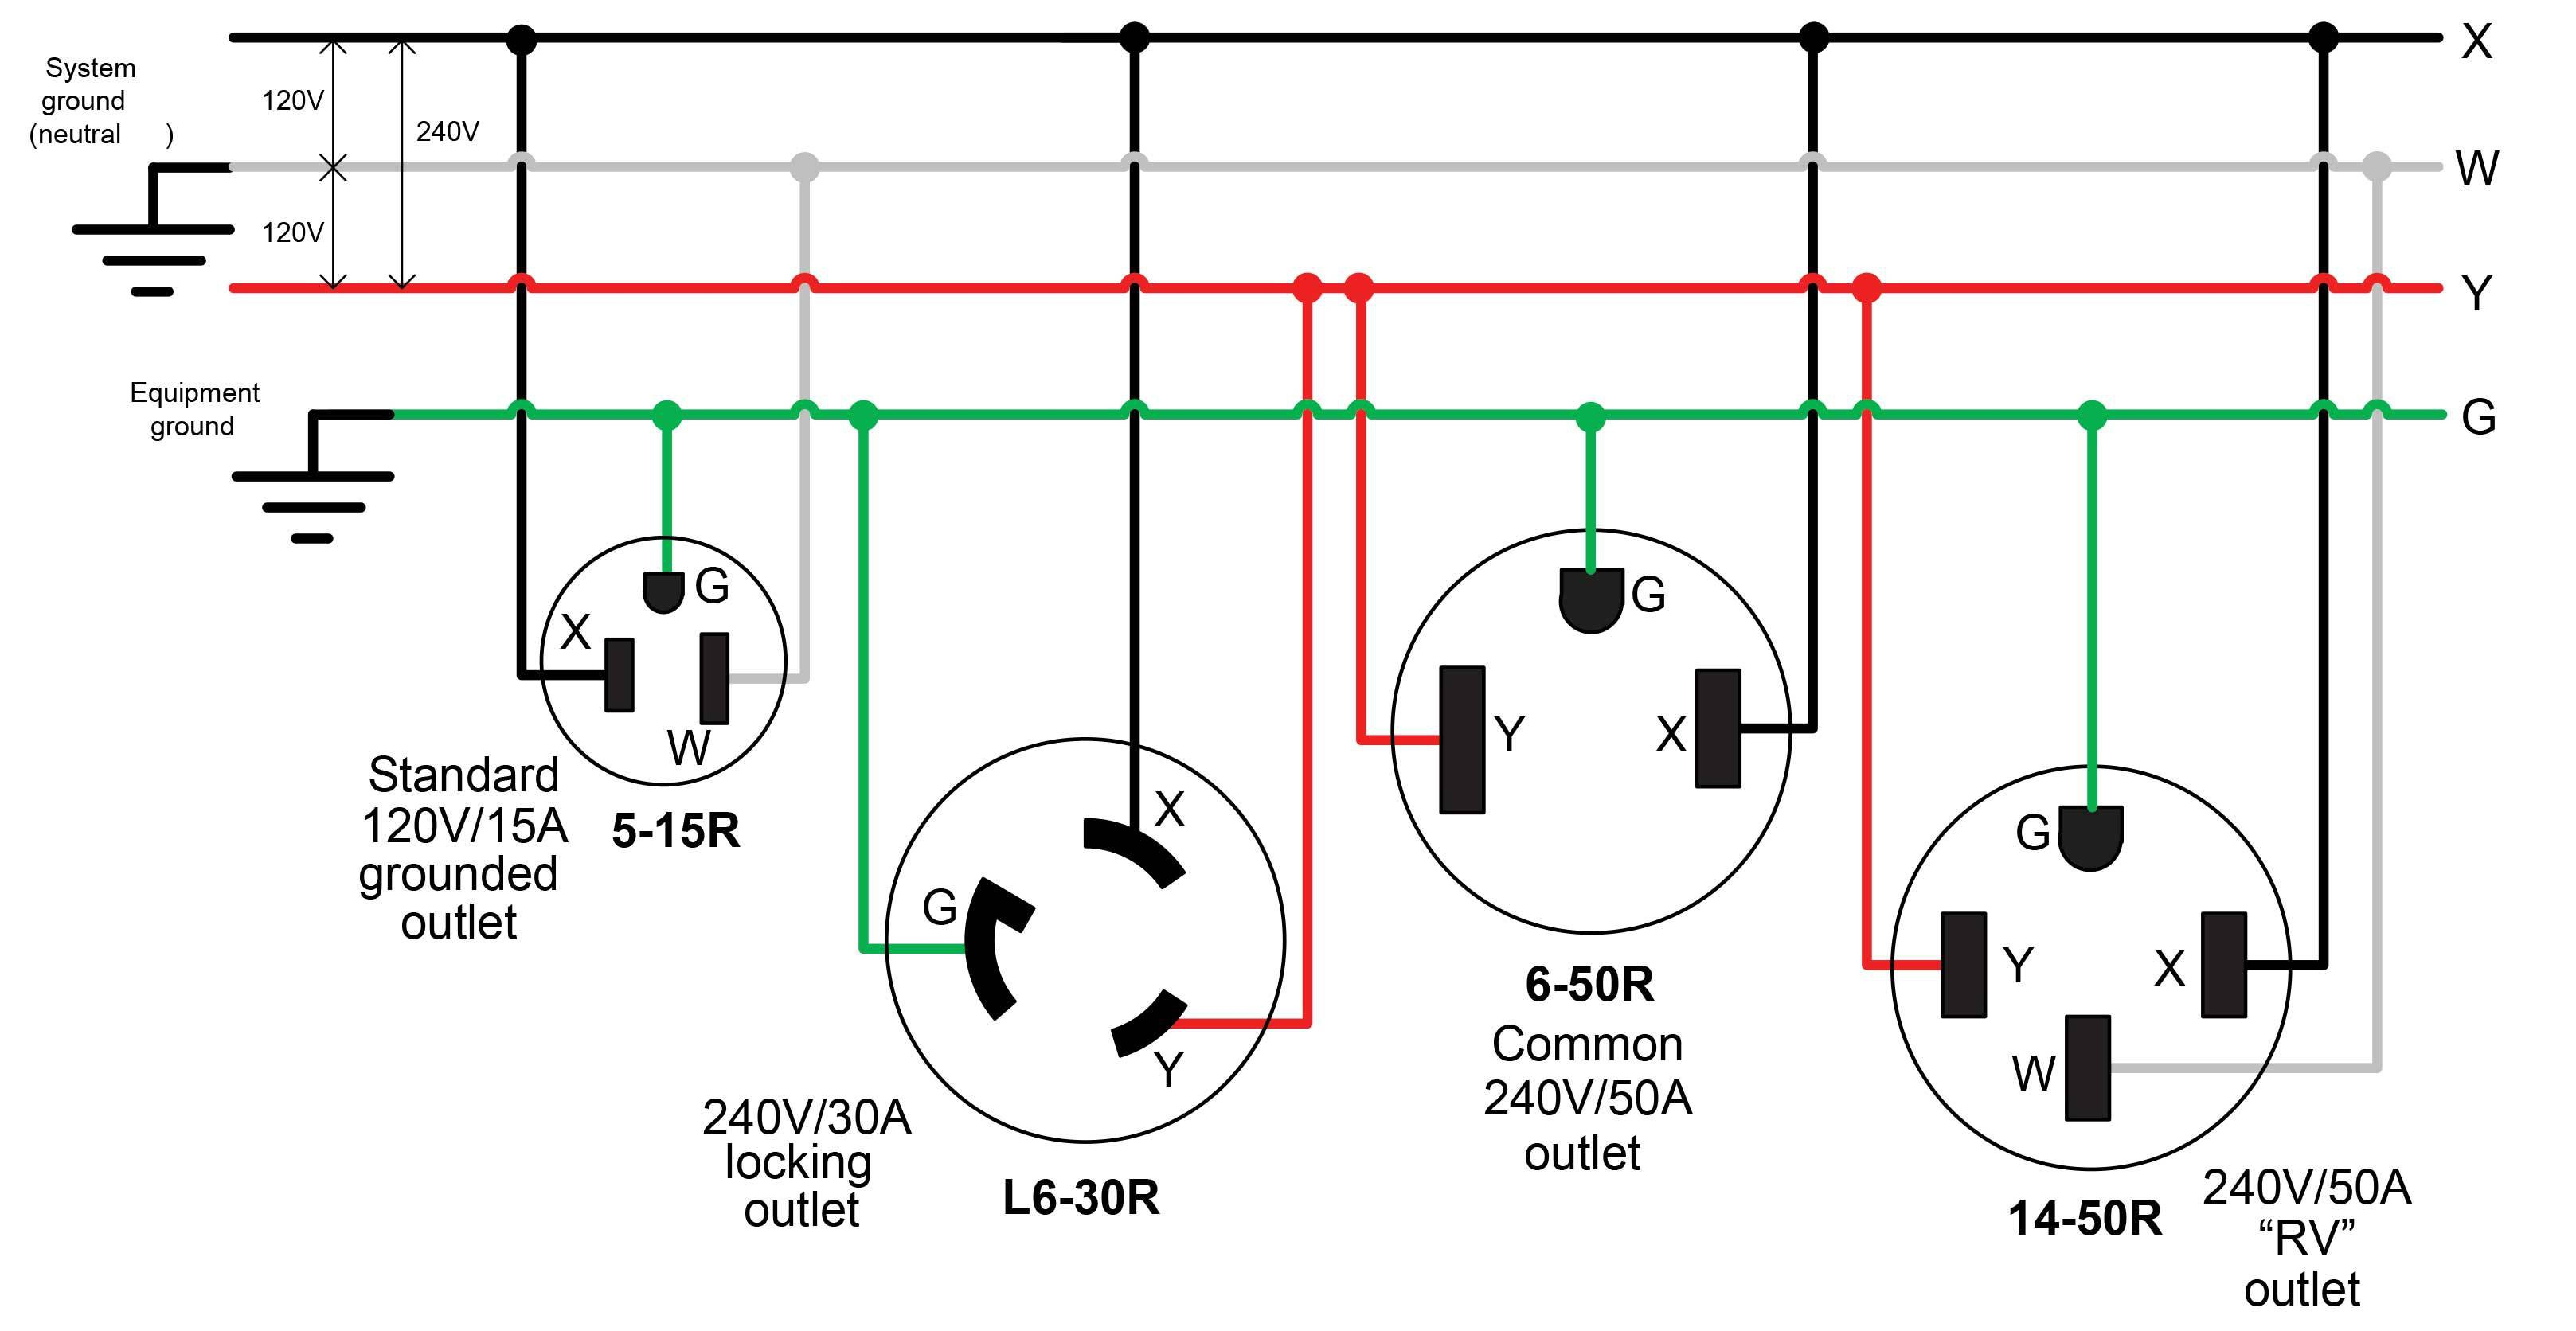 50 Amp To 30 Amp Wiring Diagram   Manual E-Books - 50 Amp Plug Wiring Diagram